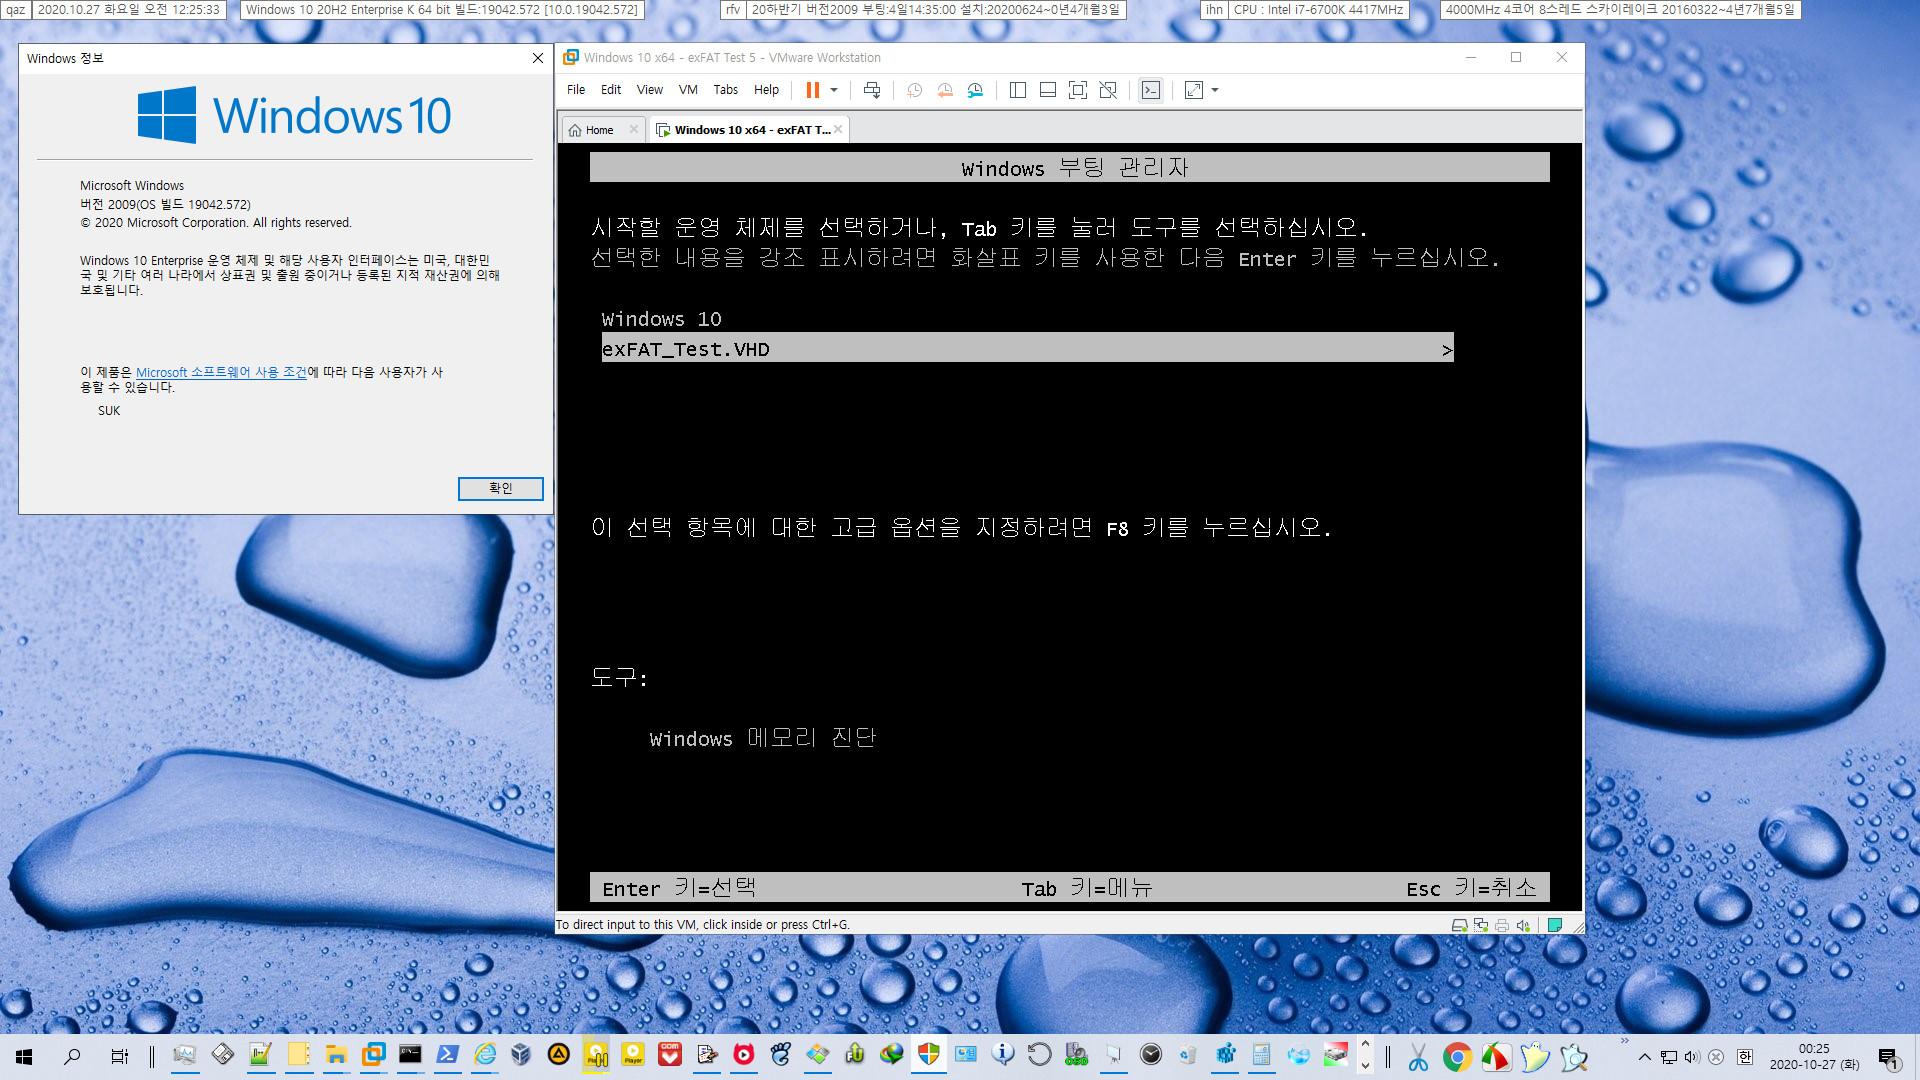 exFAT 포맷으로도 VHD 부팅이 Windows 10 버전 1903부터 된다고 하여 테스트 - 생고생만 하다가 컴퓨터 먹통 2번이나 되고 그만뒀습니다 2020-10-27_002533.jpg